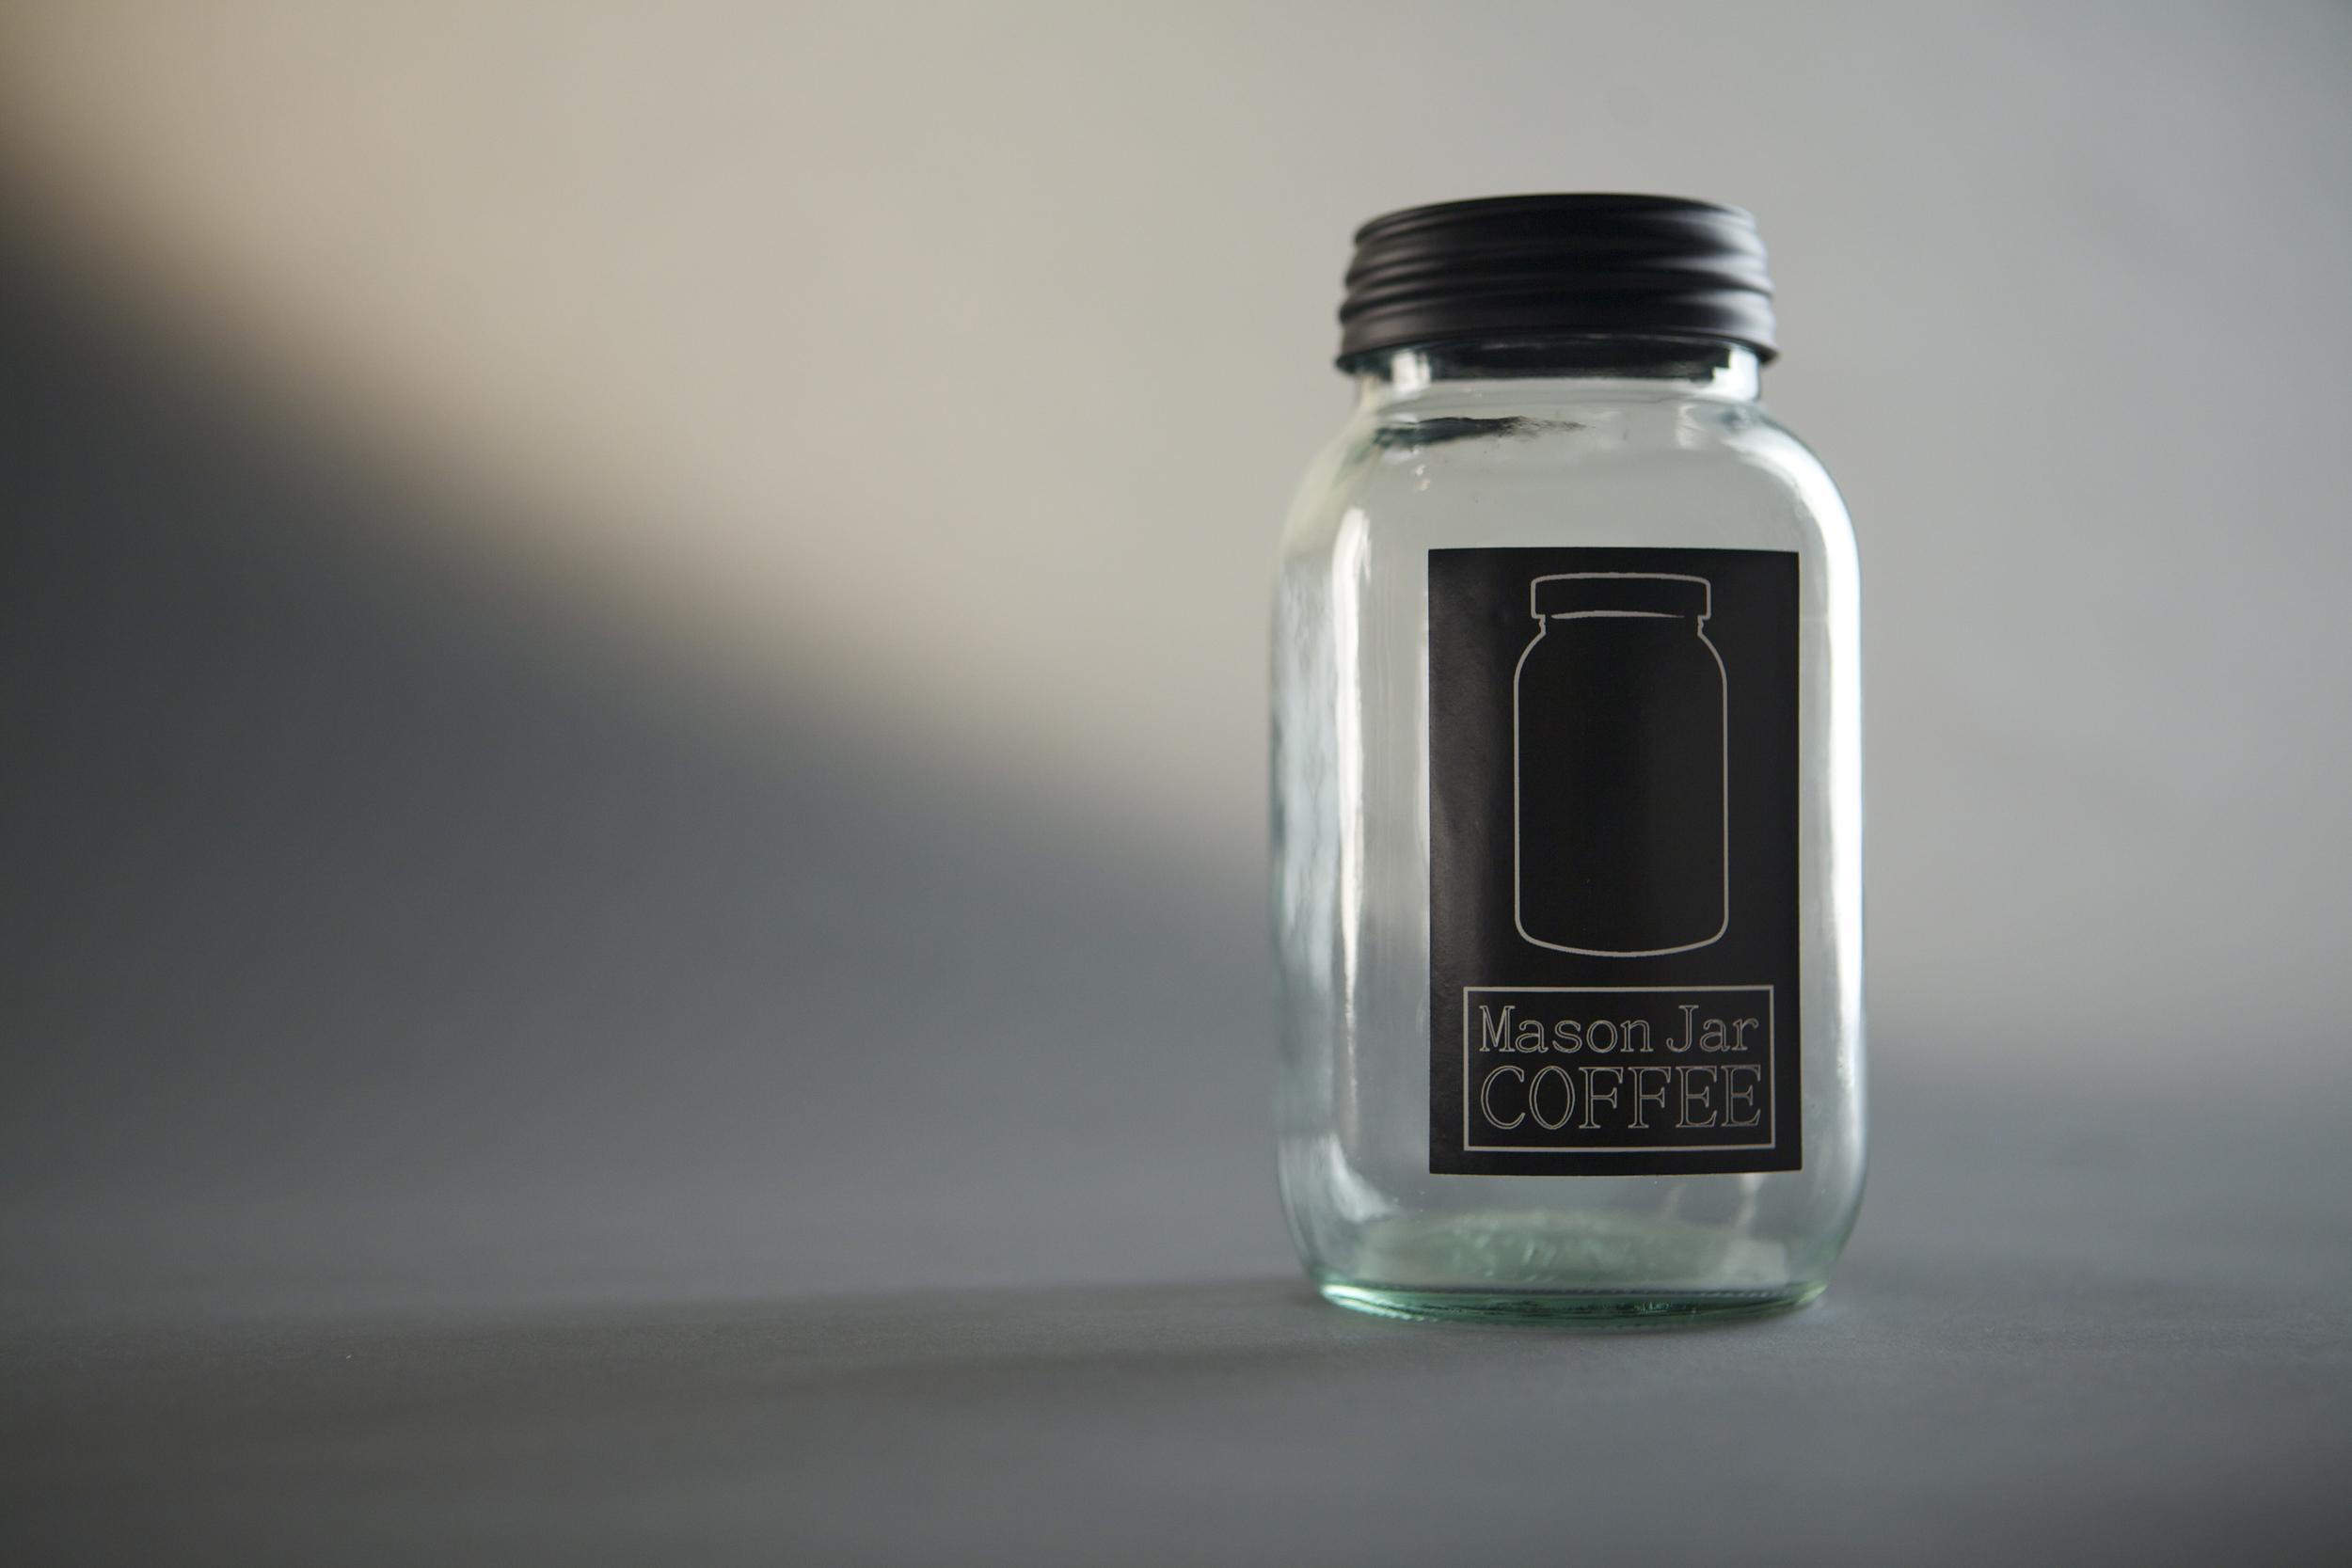 mason jar coffee product shot.jpg